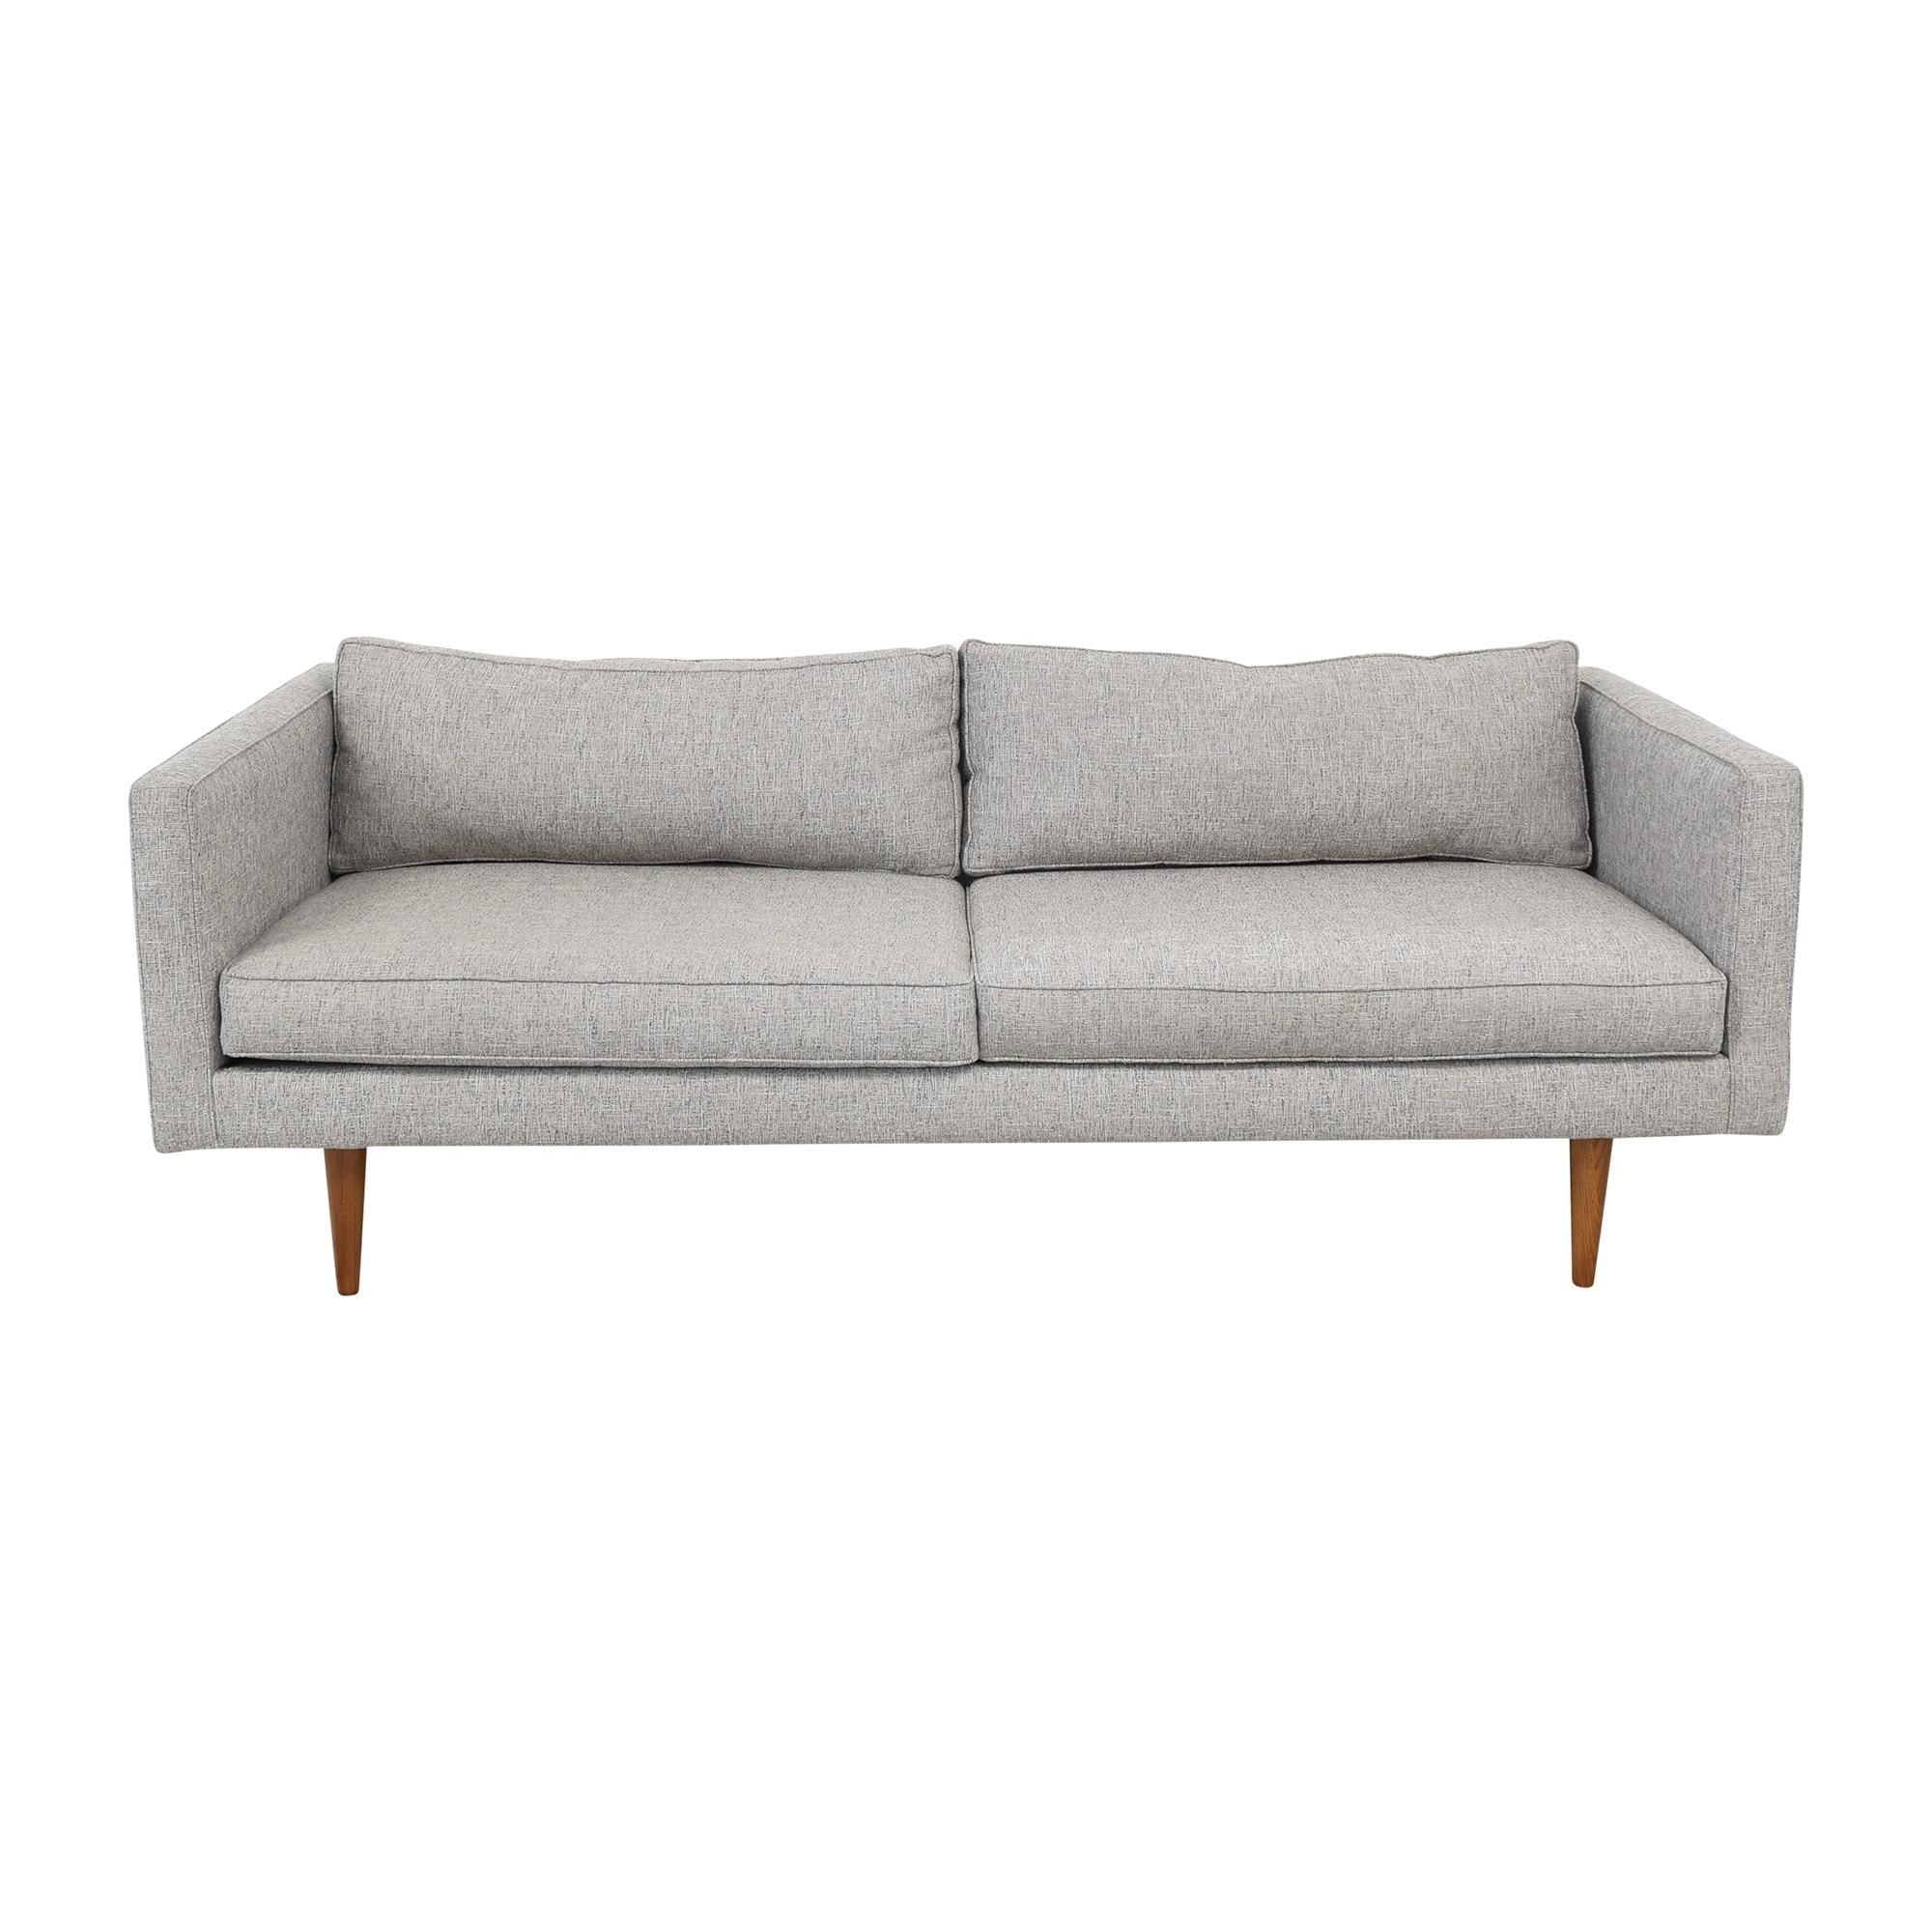 West Elm Monroe Mid-Century Sofa / Classic Sofas